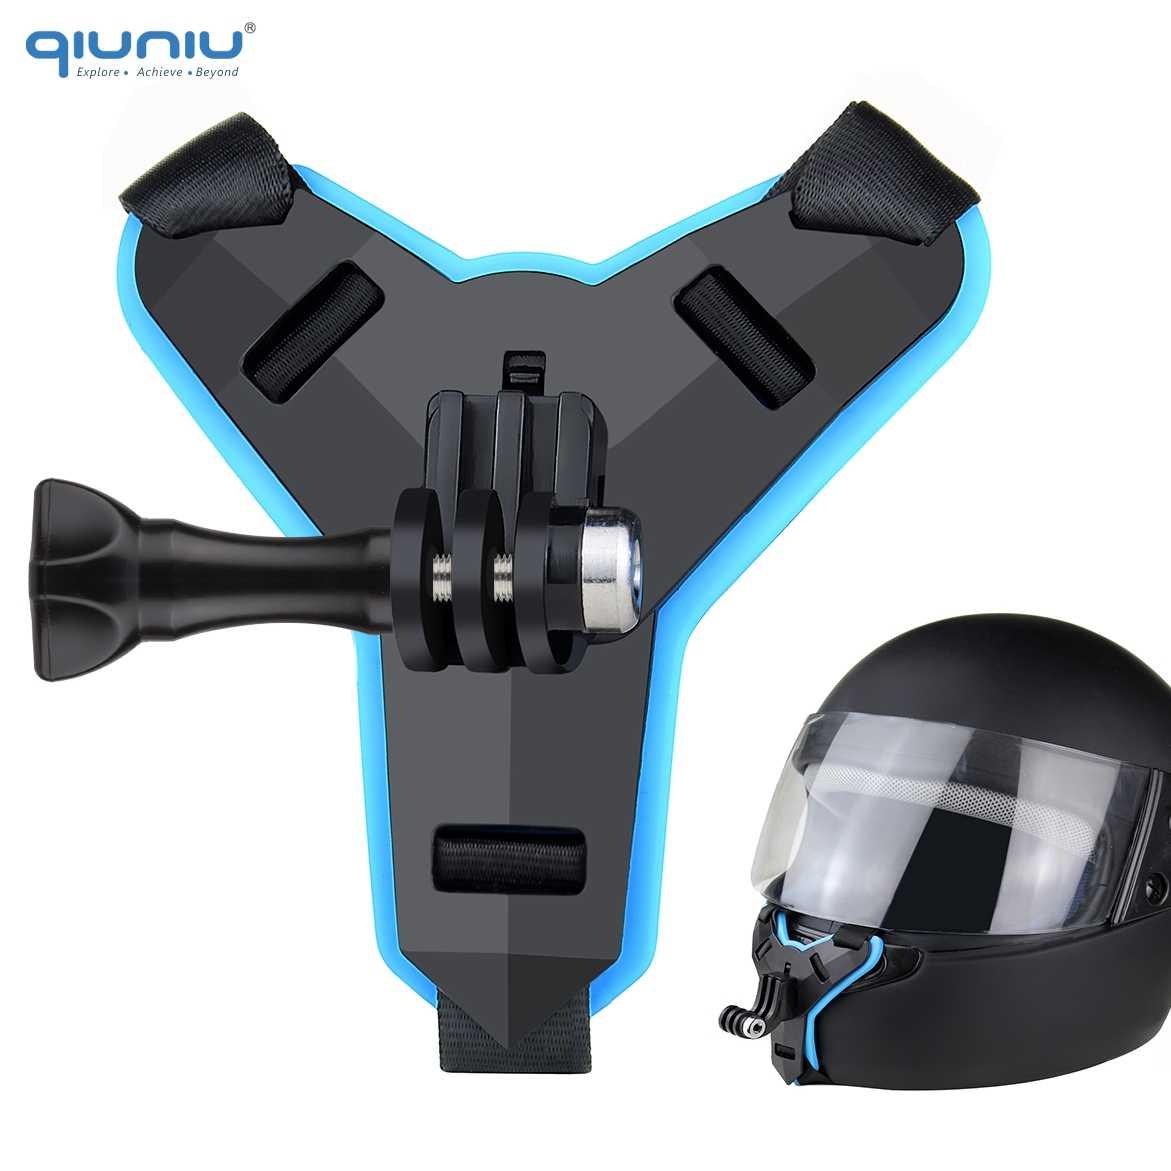 Qiuniu オートバイヘルメットフロントあごブラケットホルダー固定移動プロヒーロー 8 7 5 4 dji osmo アクション移動プロアクセサリー